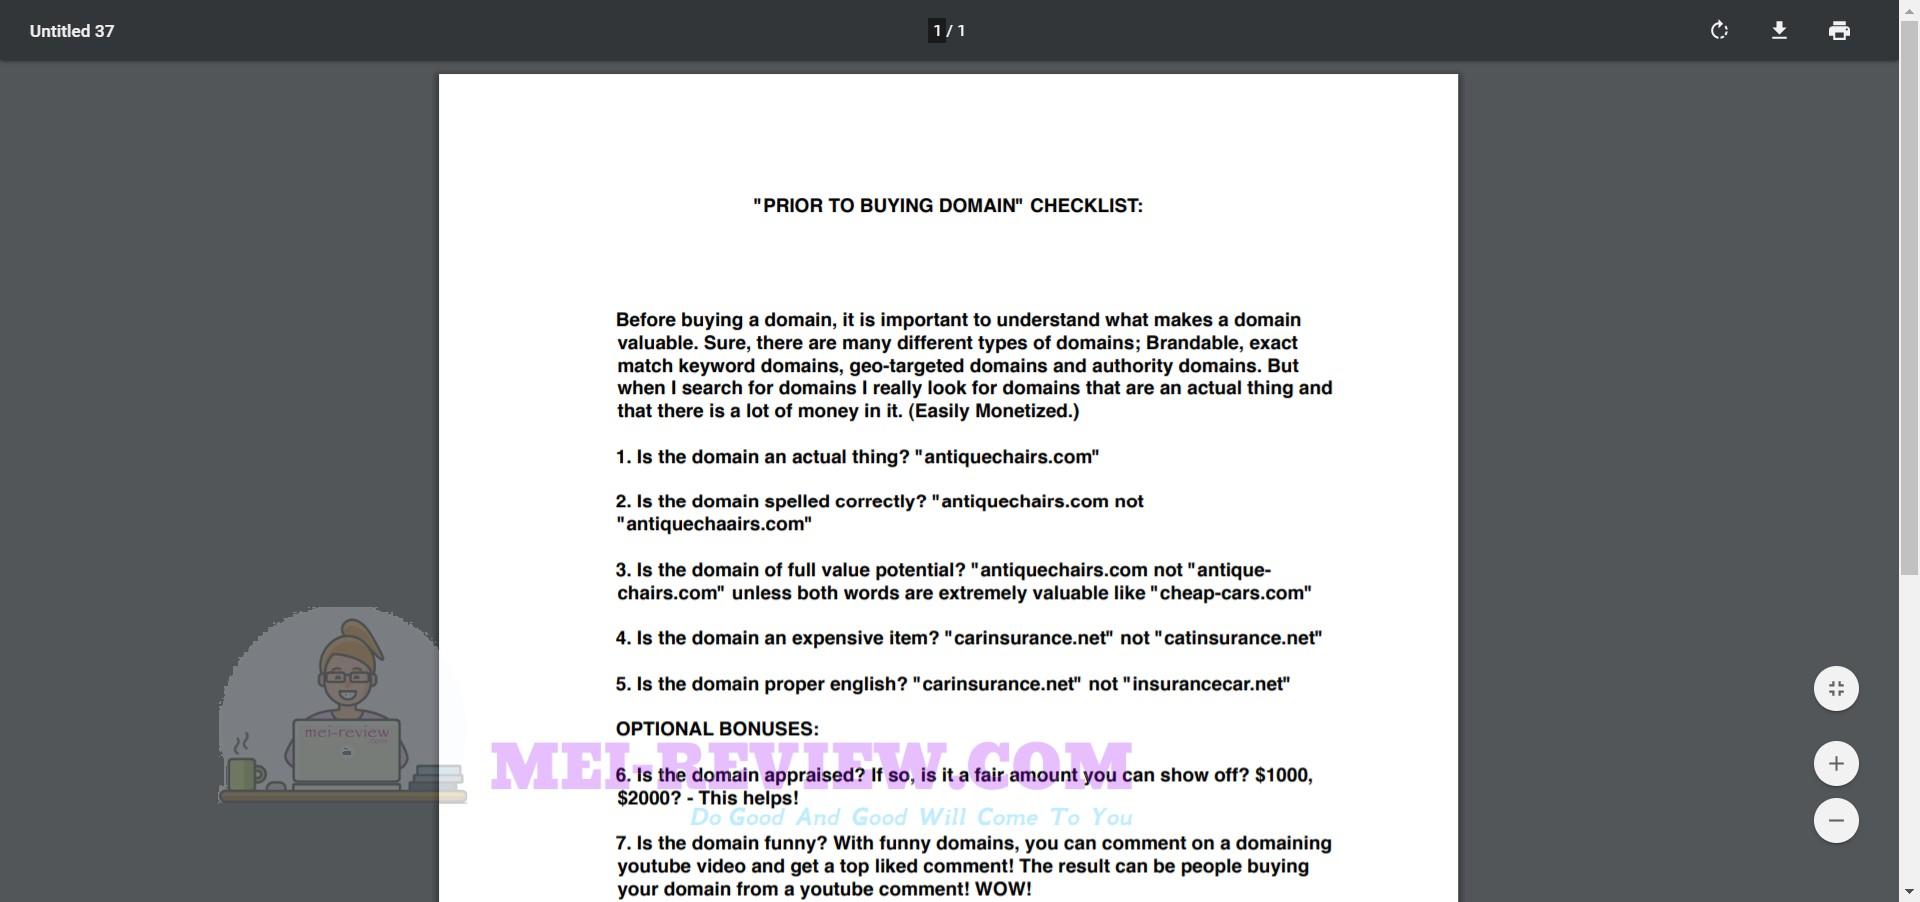 Marketing-Reward-Domains-Checklists